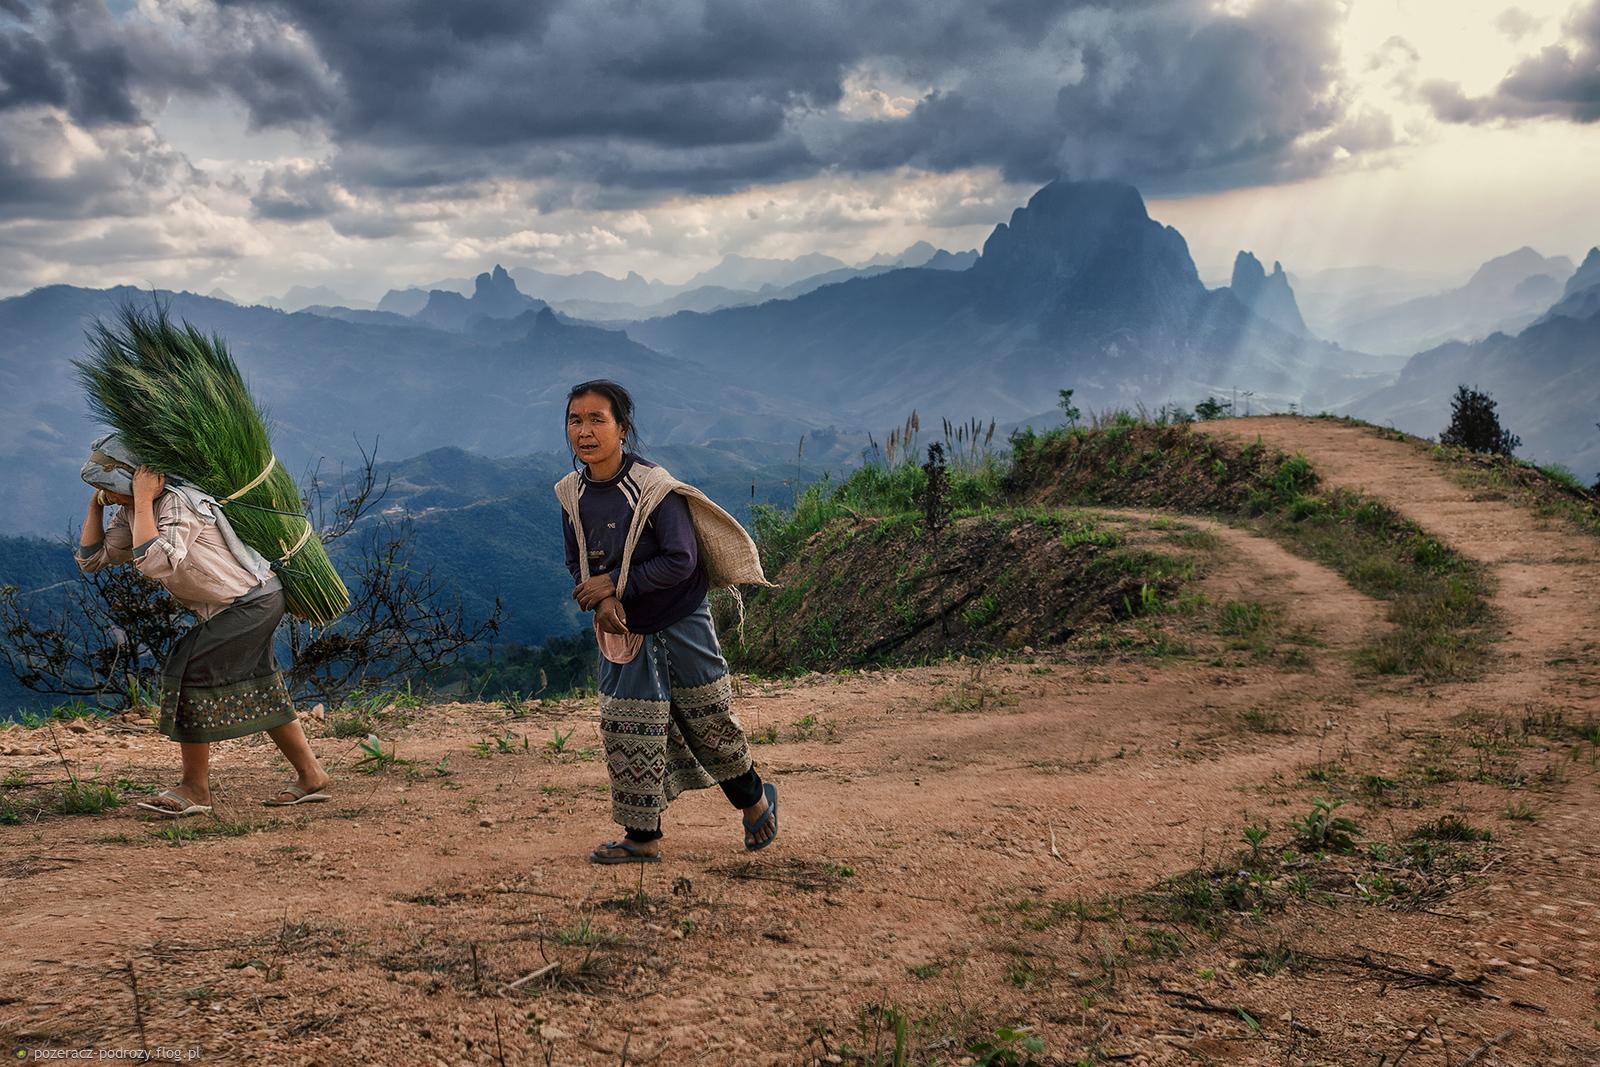 w górach Laosu